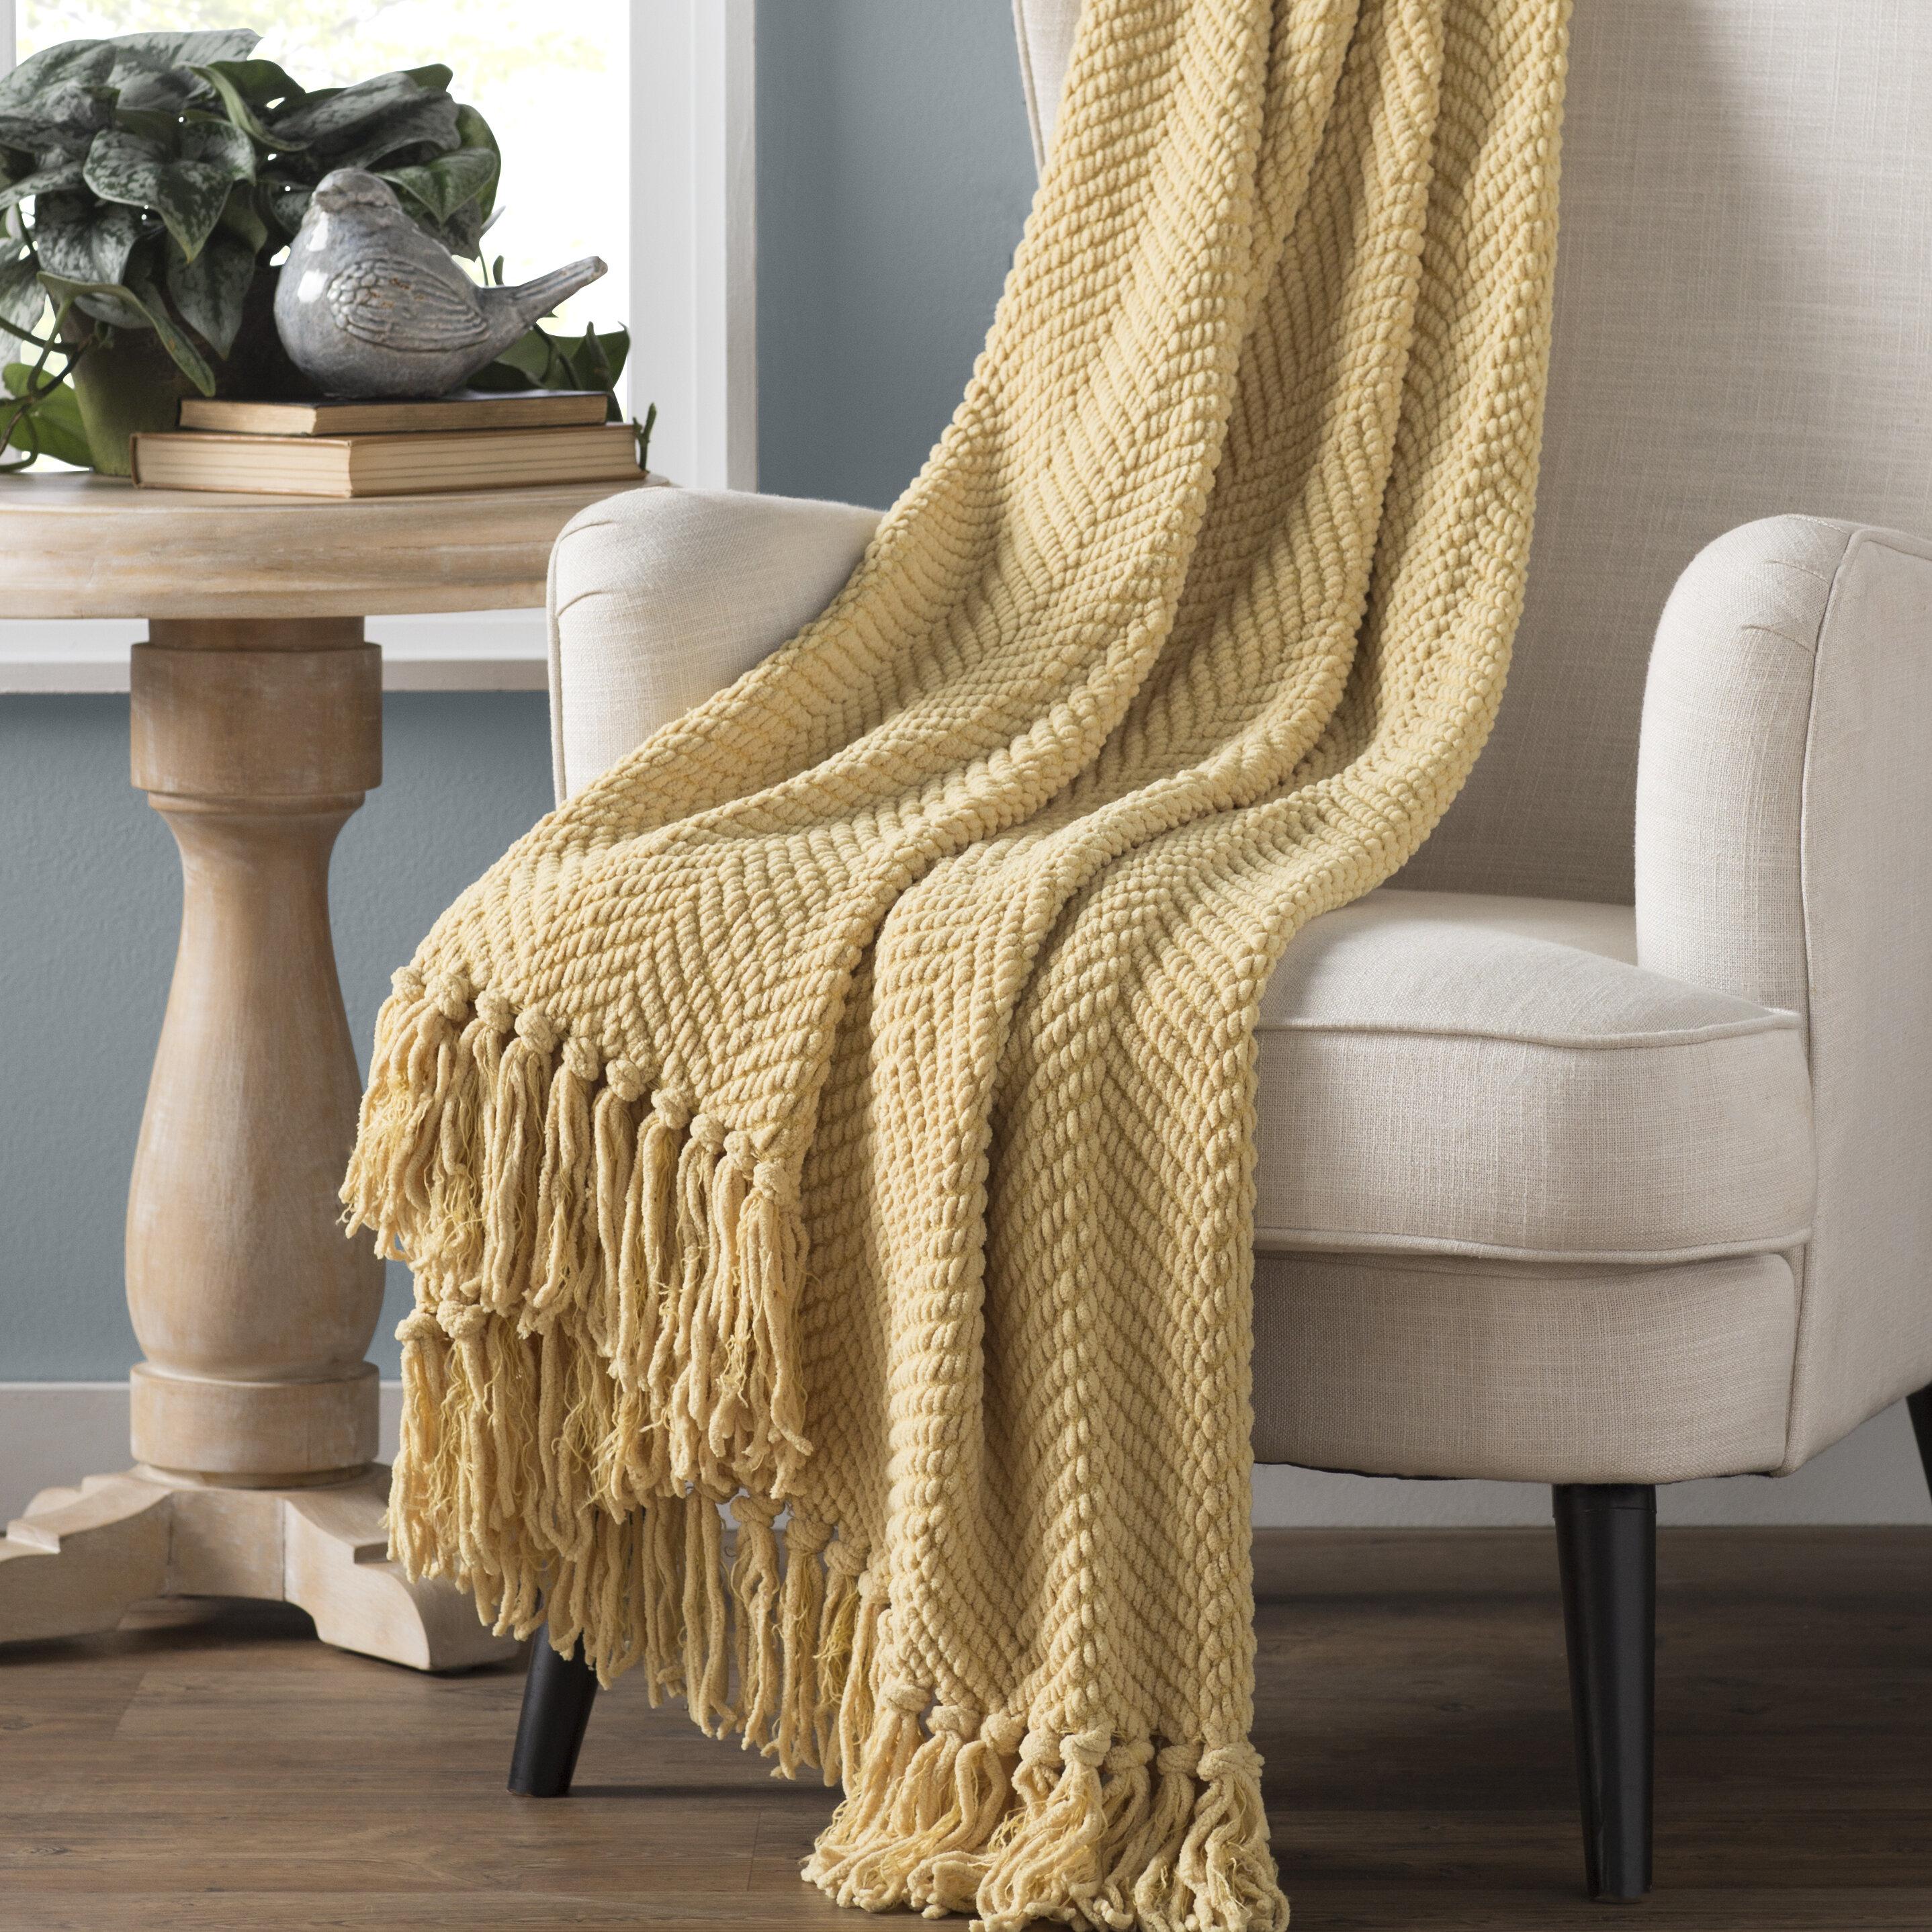 Blankets Throws You Ll Love In 2021 Wayfair